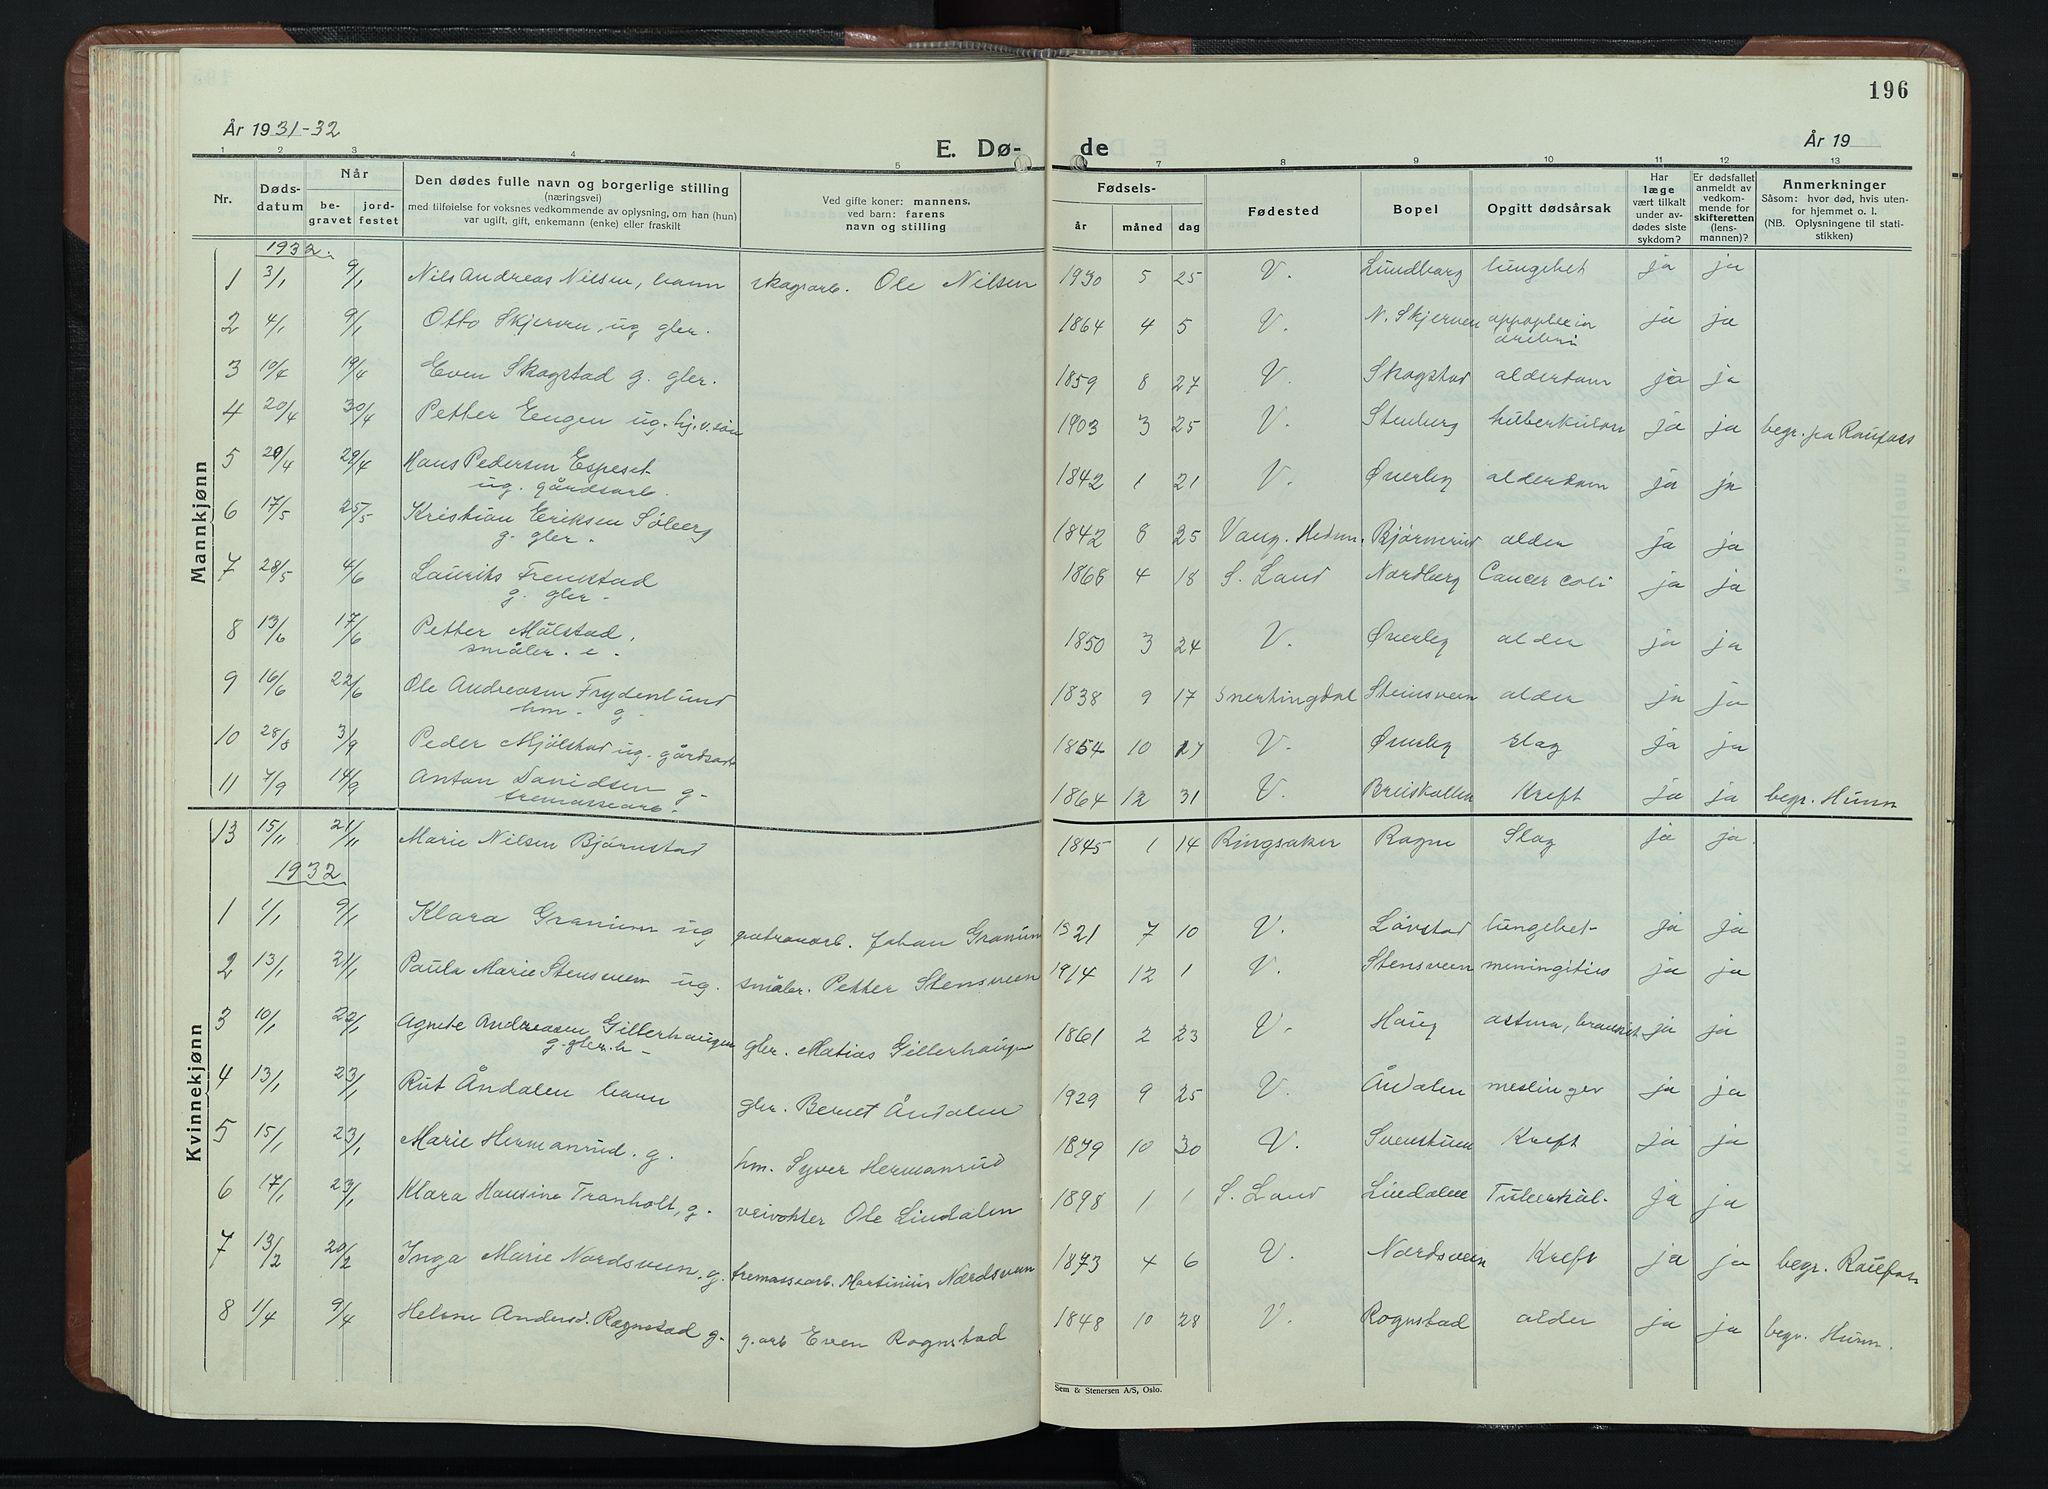 SAH, Vardal prestekontor, H/Ha/Hab/L0018: Klokkerbok nr. 18, 1931-1951, s. 196